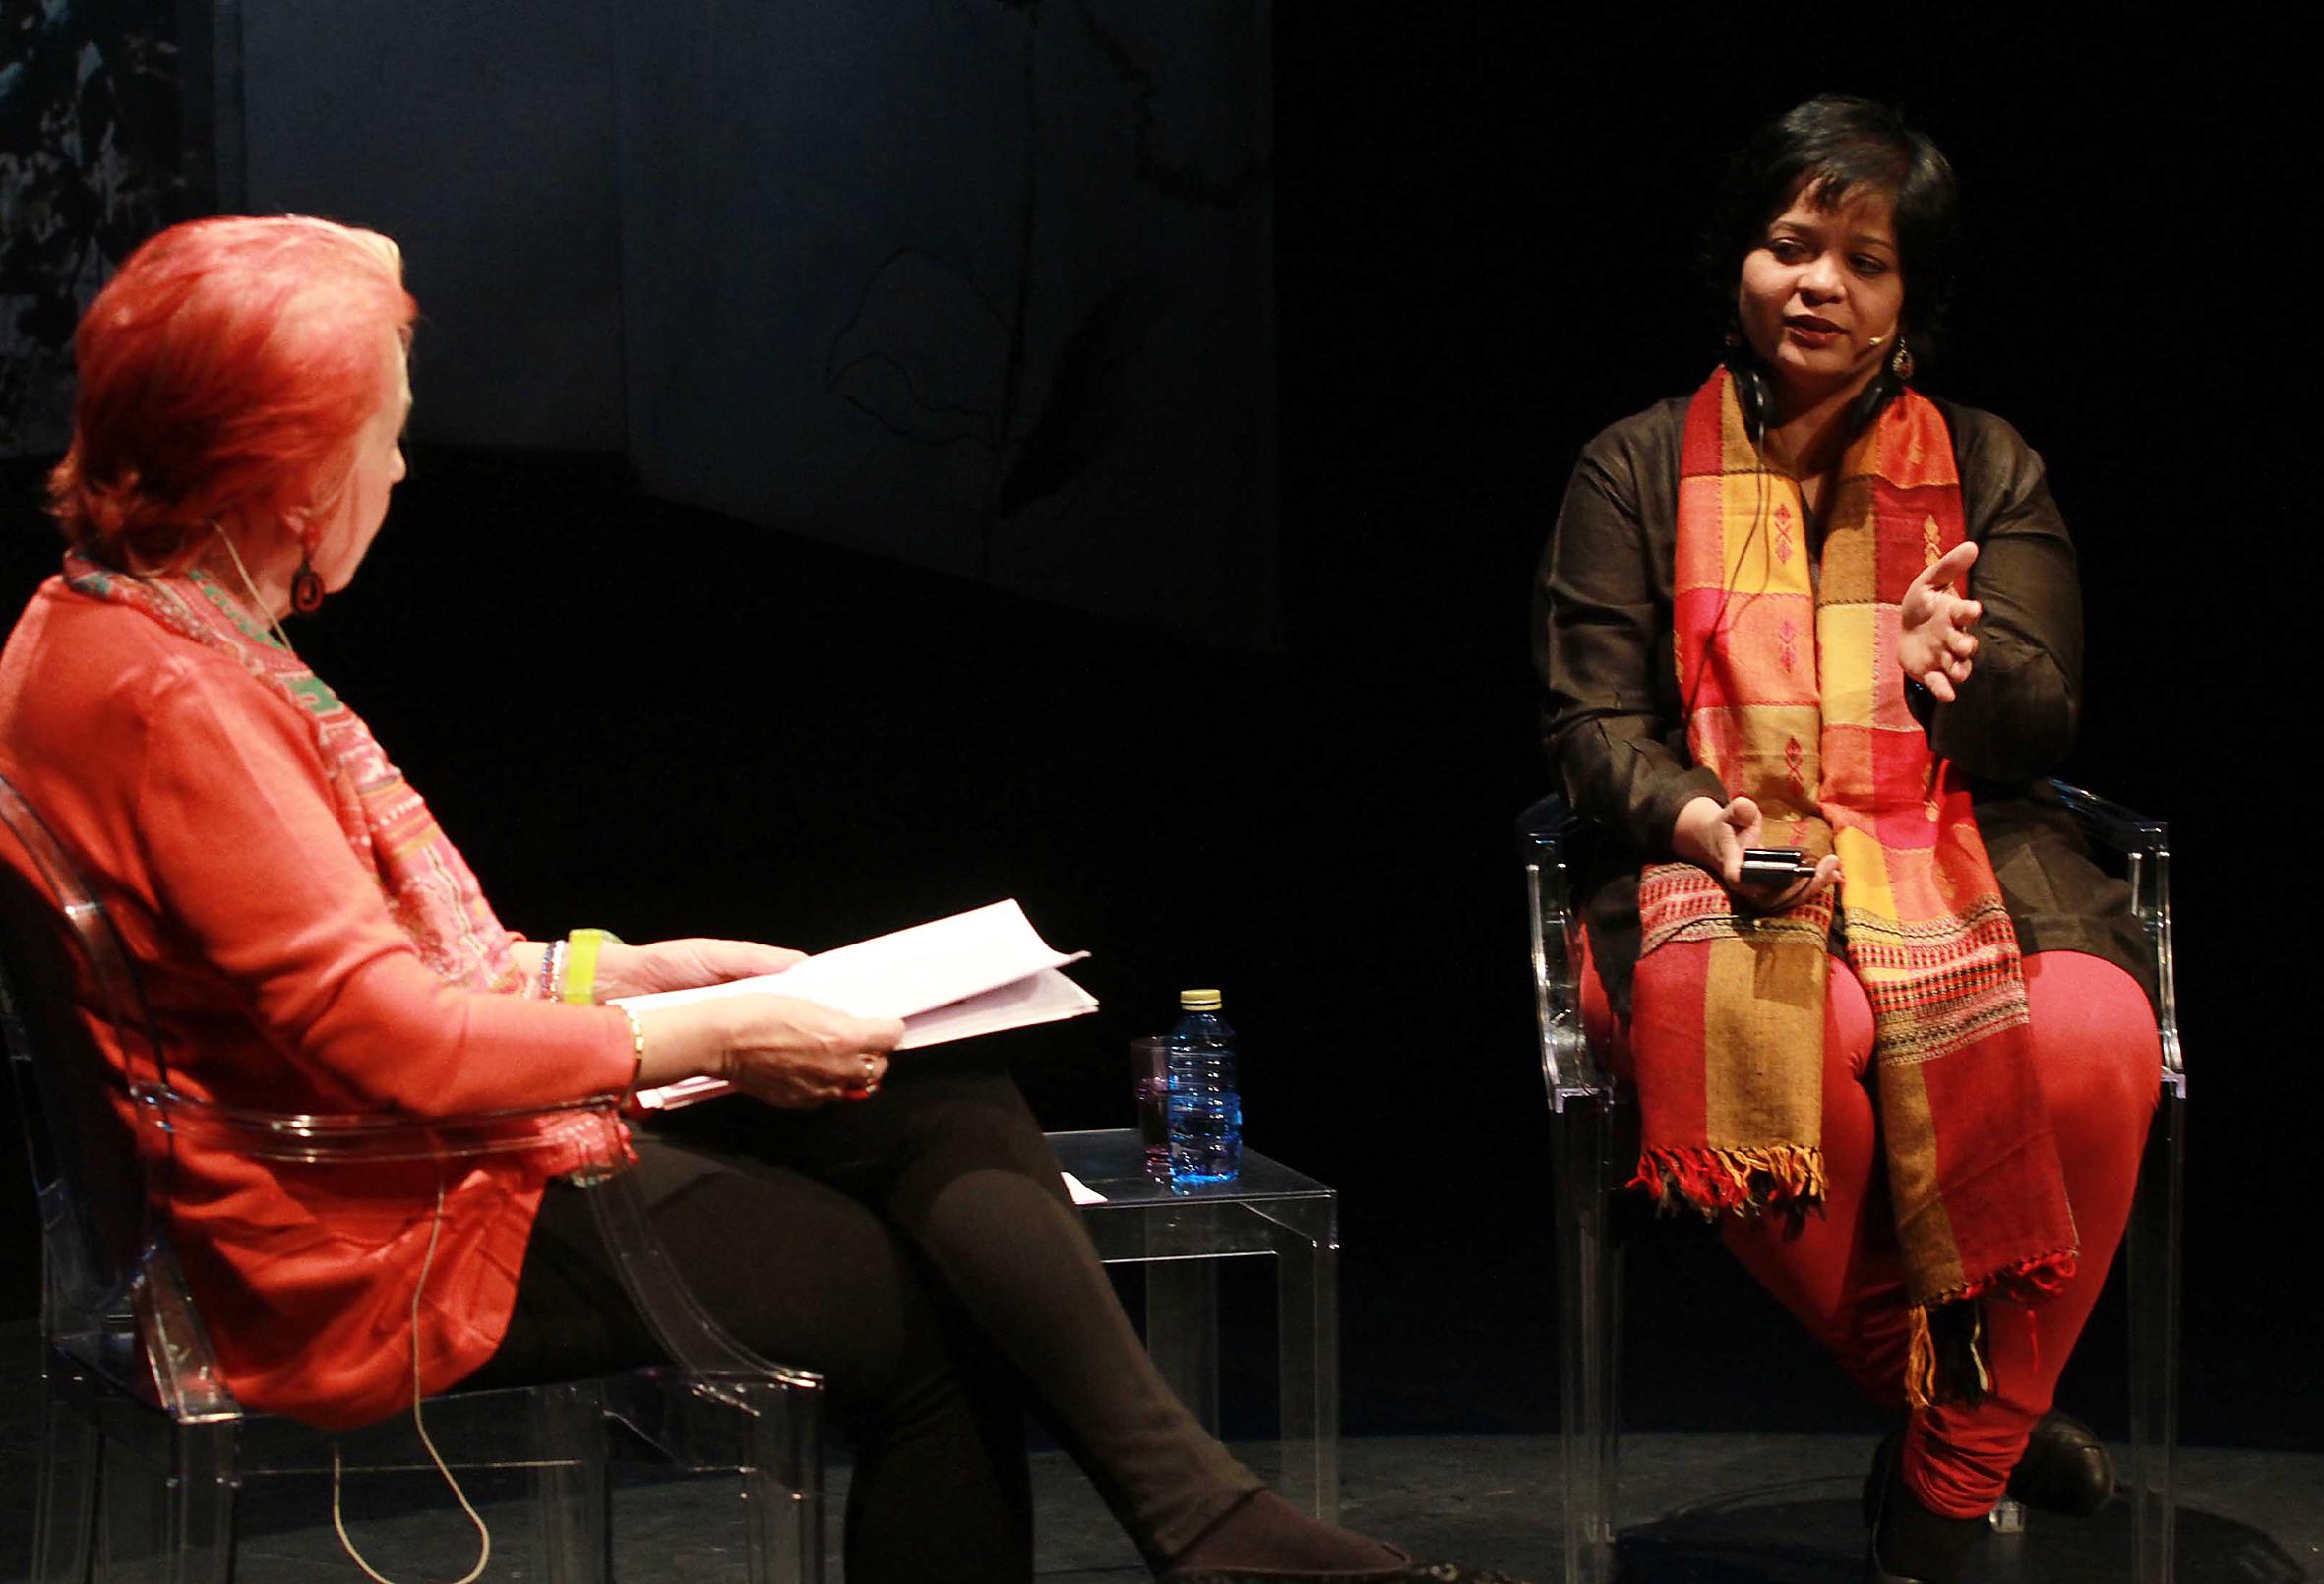 Rosa Maria Calaf y Manjula Pradeep. Foto: Rosa Blanco